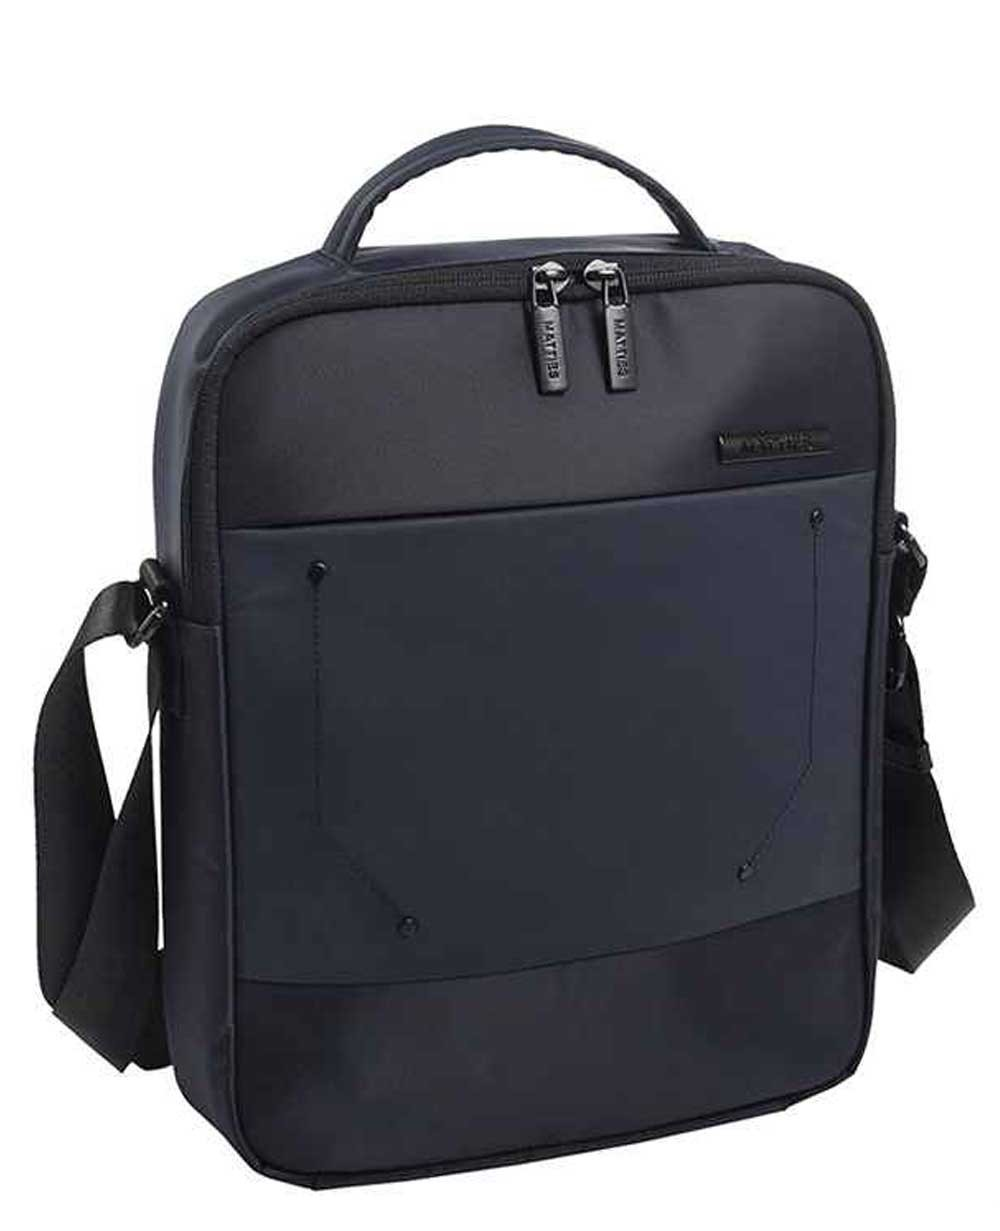 "Matties Bags 10.2"" Bandolera Nylon Negra (Foto )"